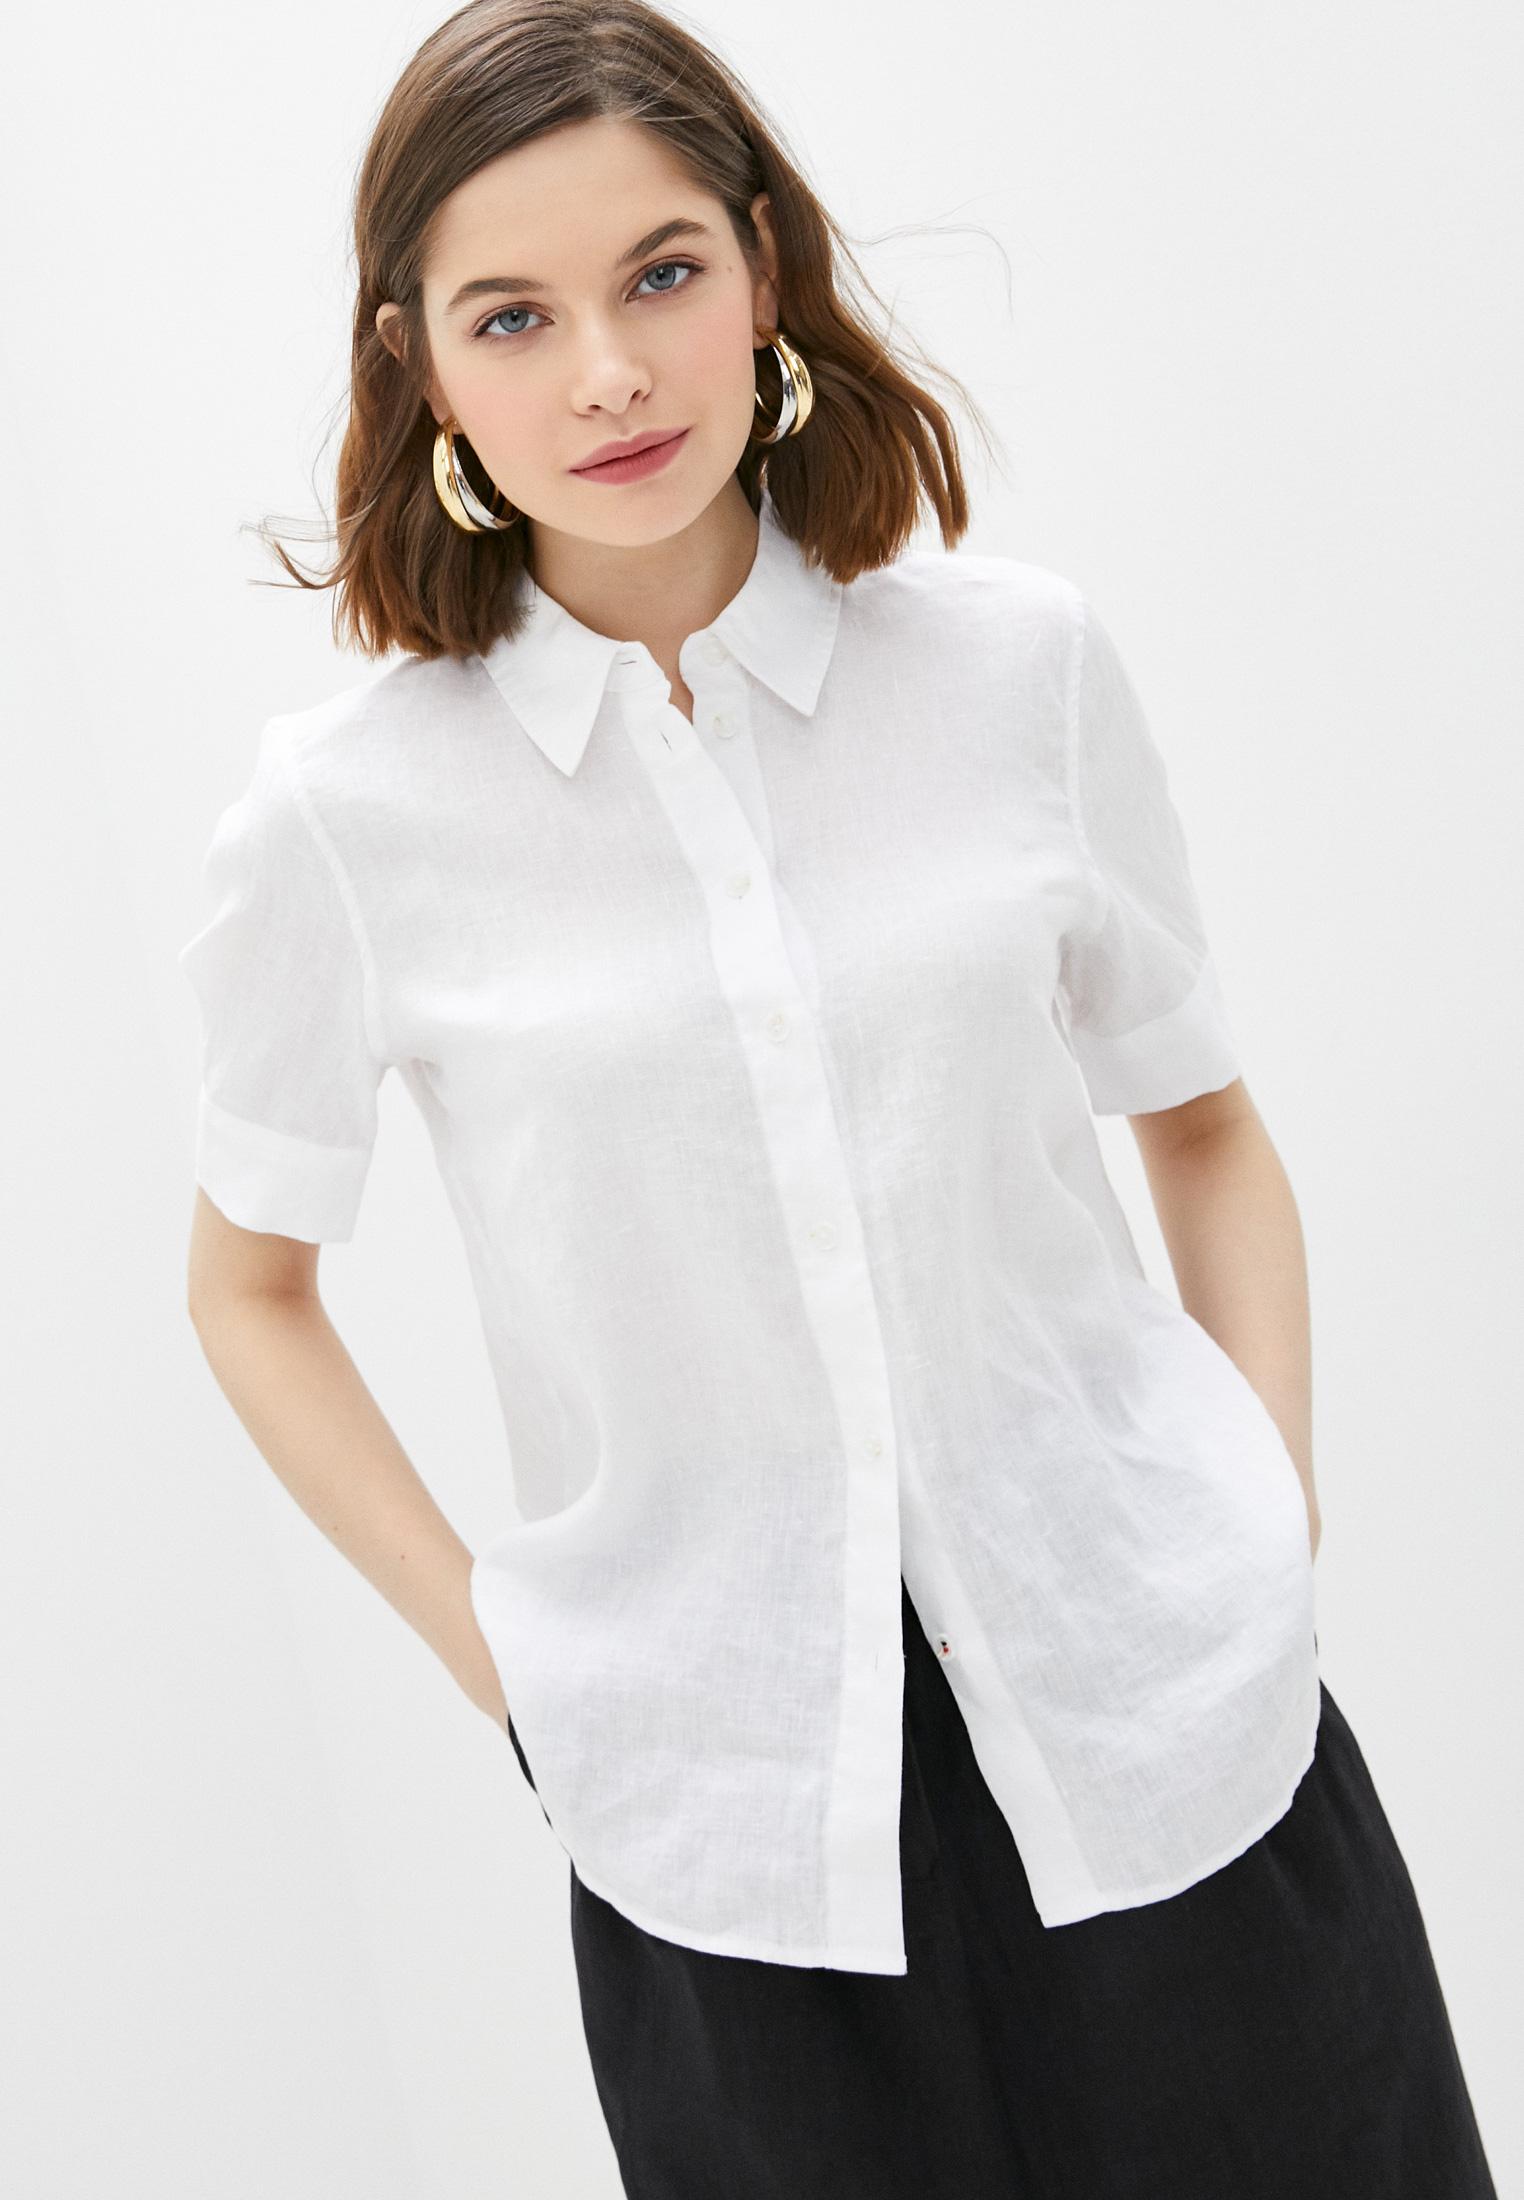 Рубашка с коротким рукавом Tommy Hilfiger (Томми Хилфигер) WW0WW27793